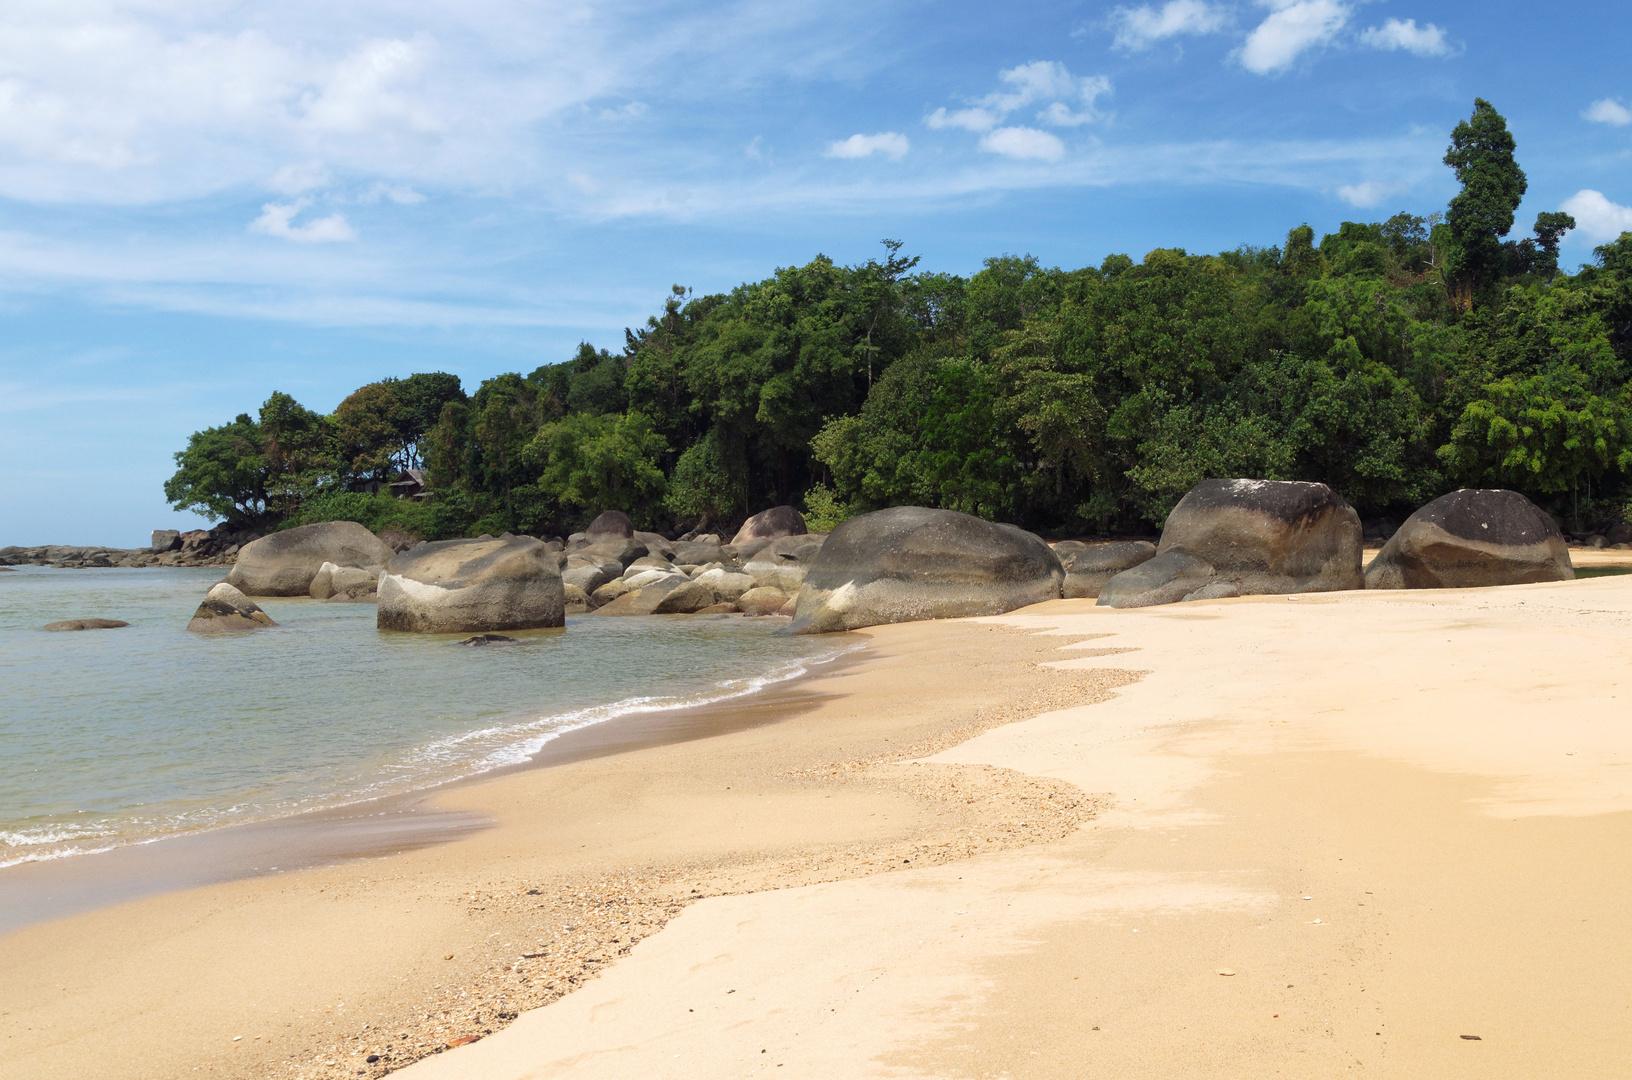 Beach südlich des Poseidon Beach, Khao Lak, Phang Nga, Thailand, Februar 2013